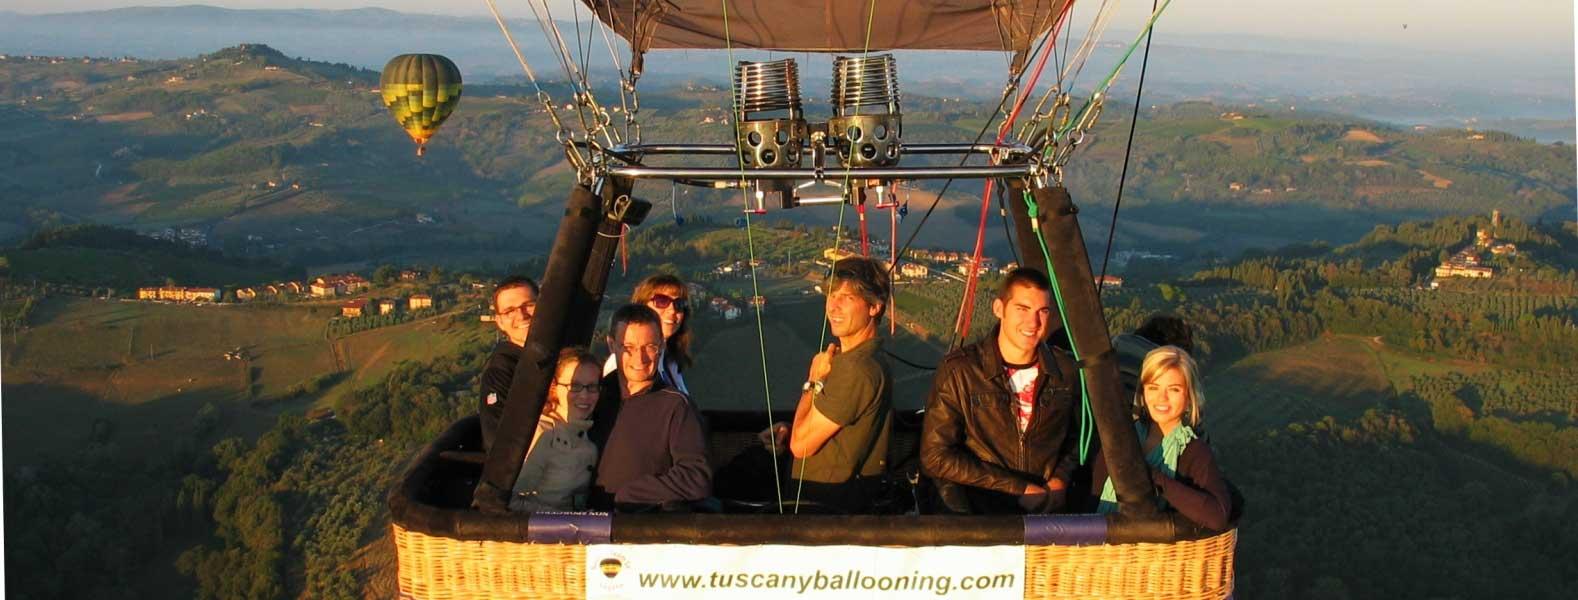 tuscany-ballooning-in-flight-over-chianti